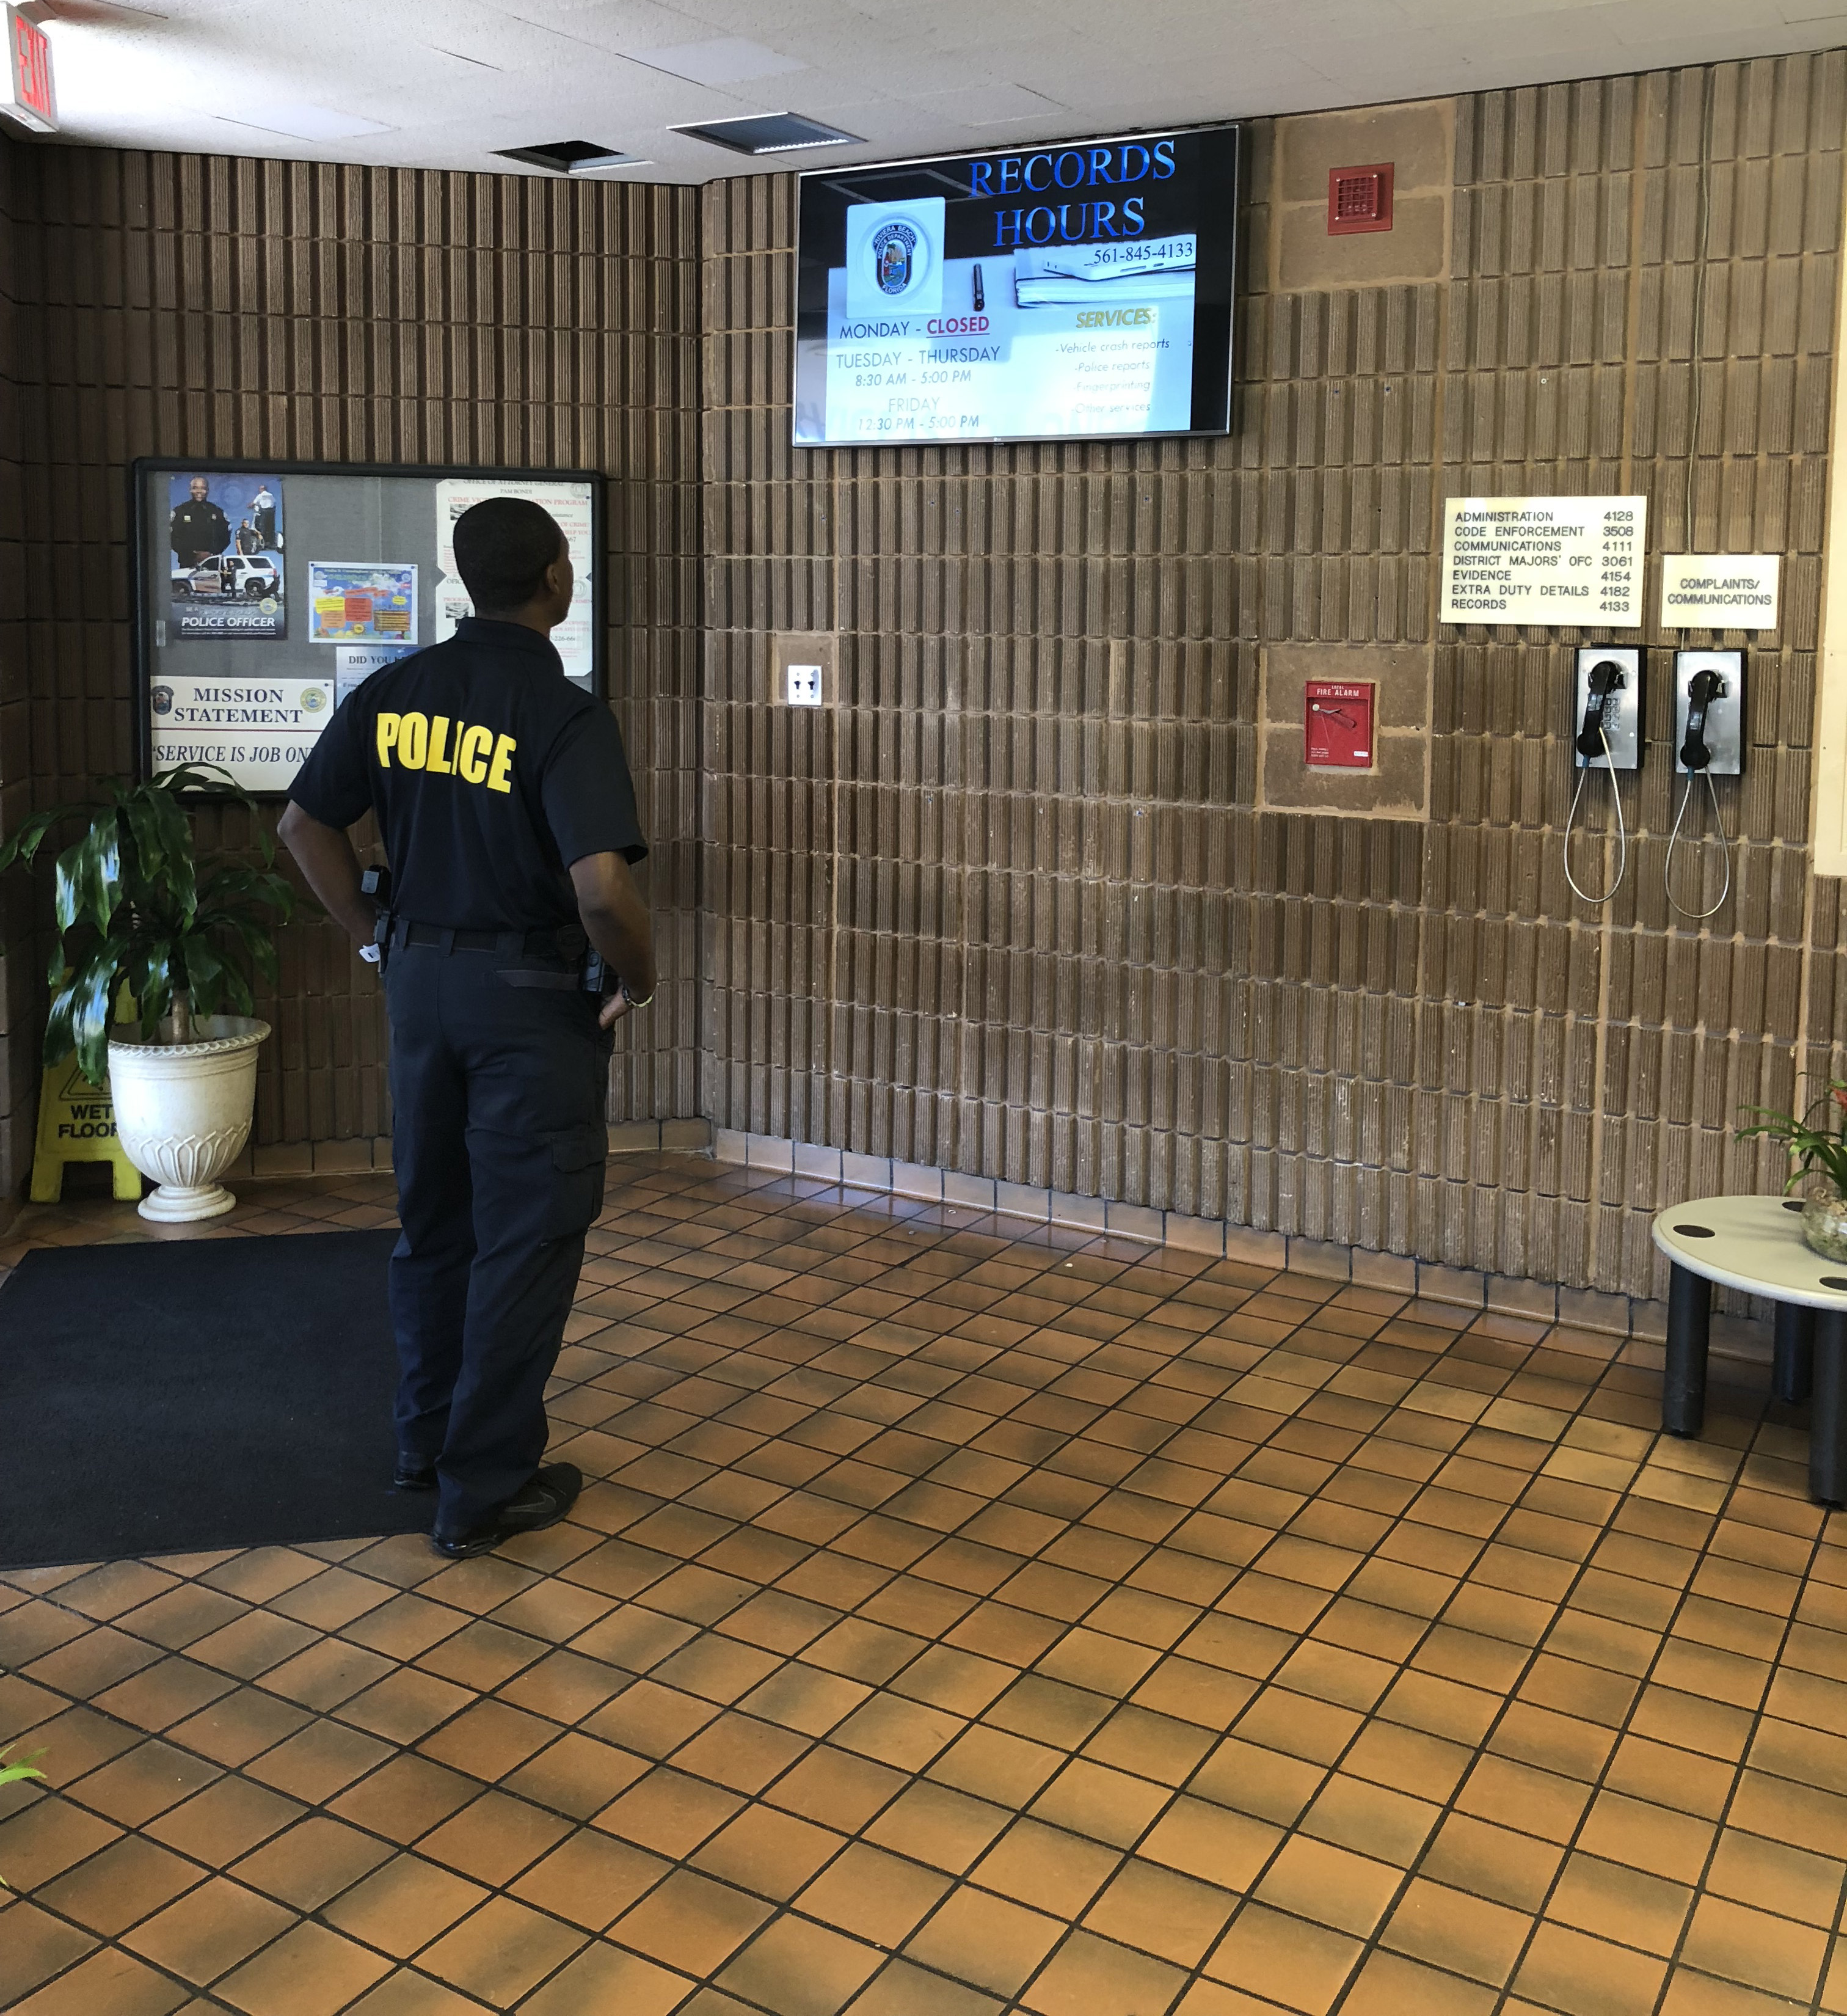 Screensaver use in public lobby